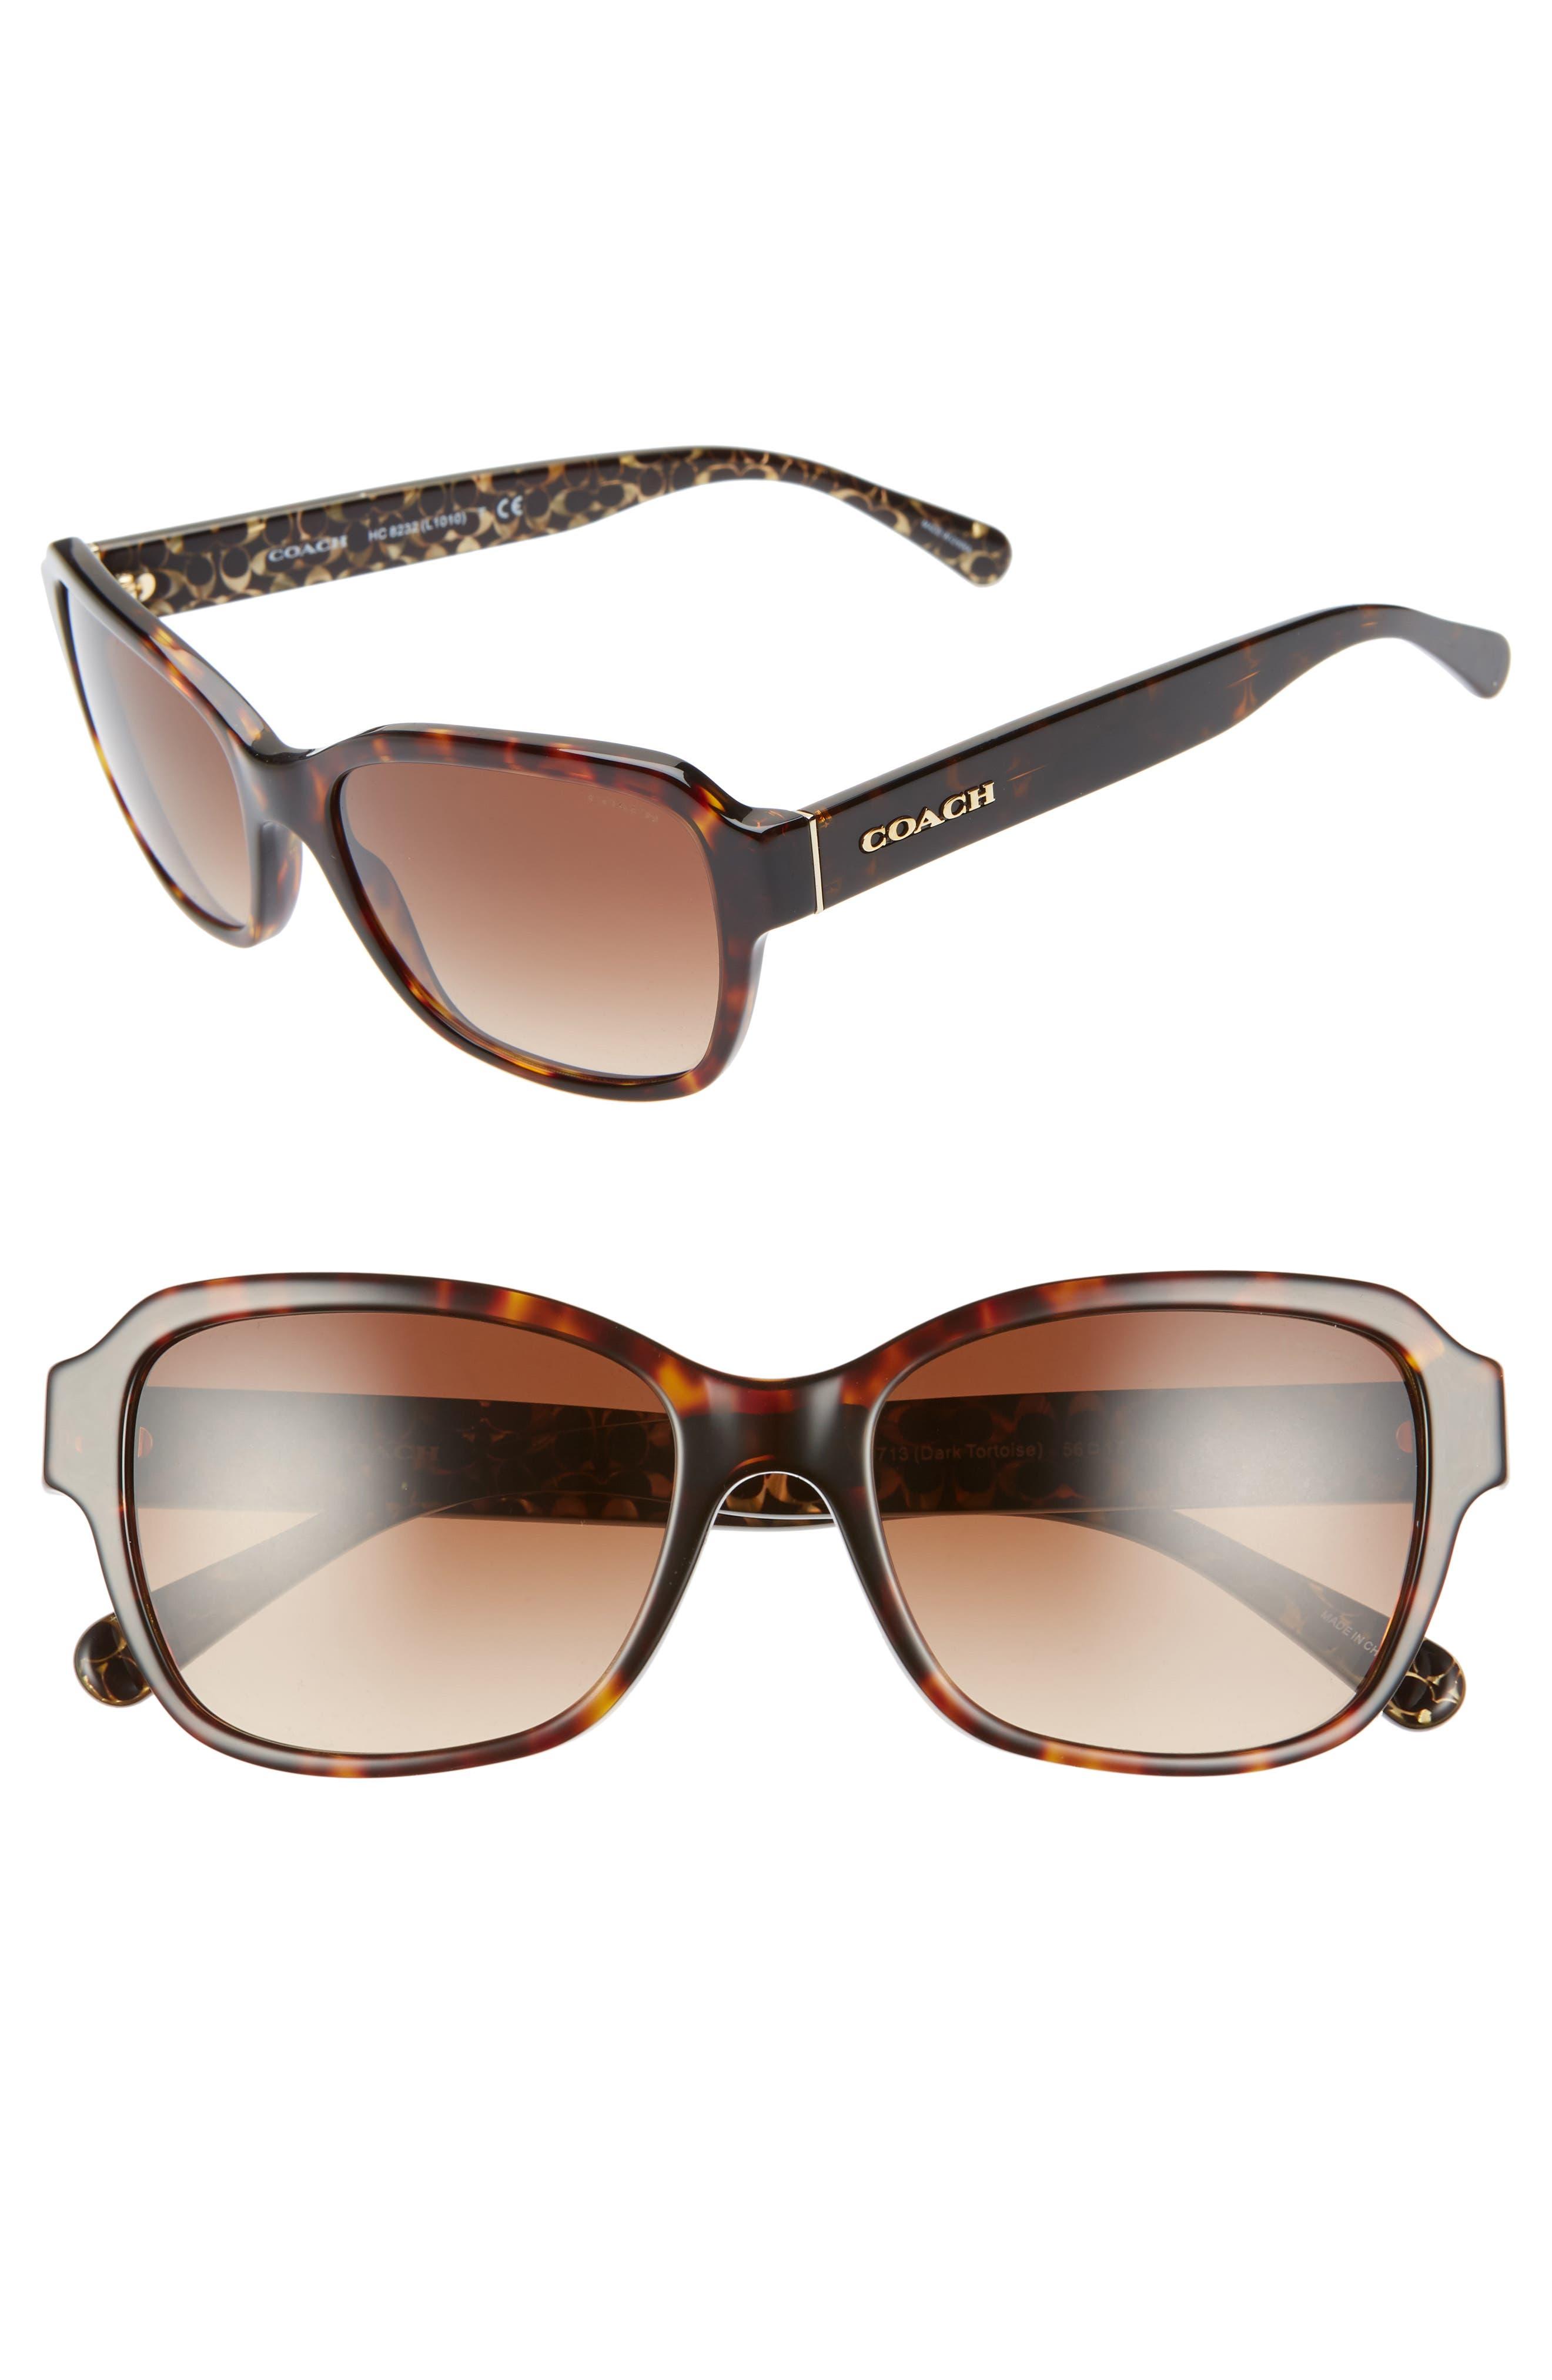 0f74a884cf4c4 COACH Sunglasses for Women